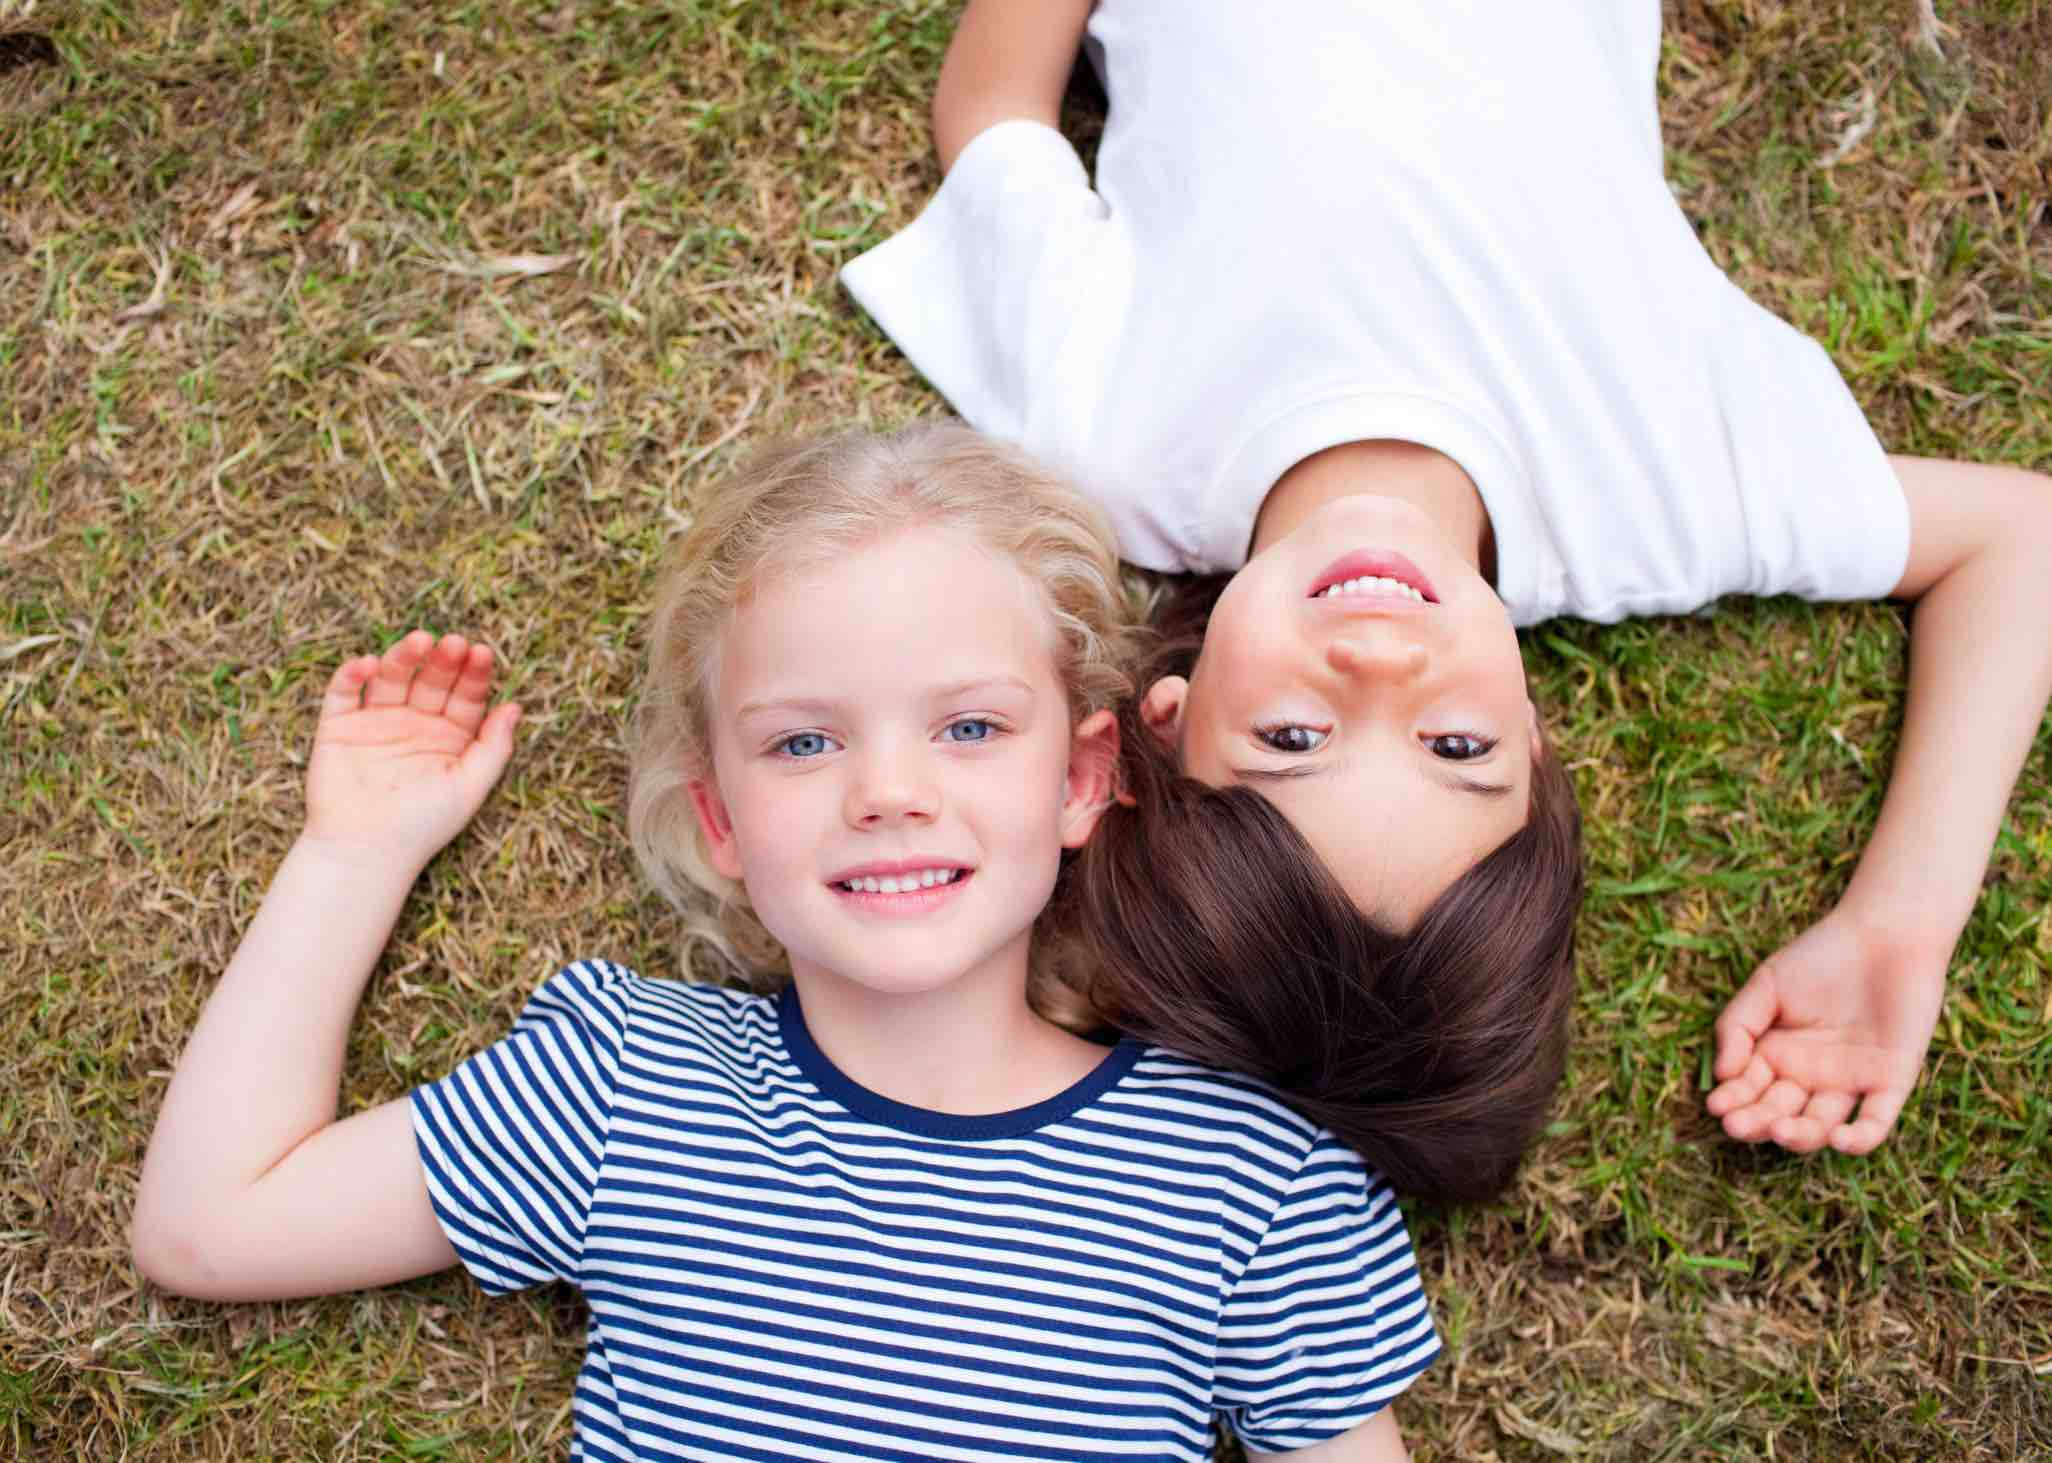 KonflikthÃ¥ndtering børn – sÃ¥dan gør du